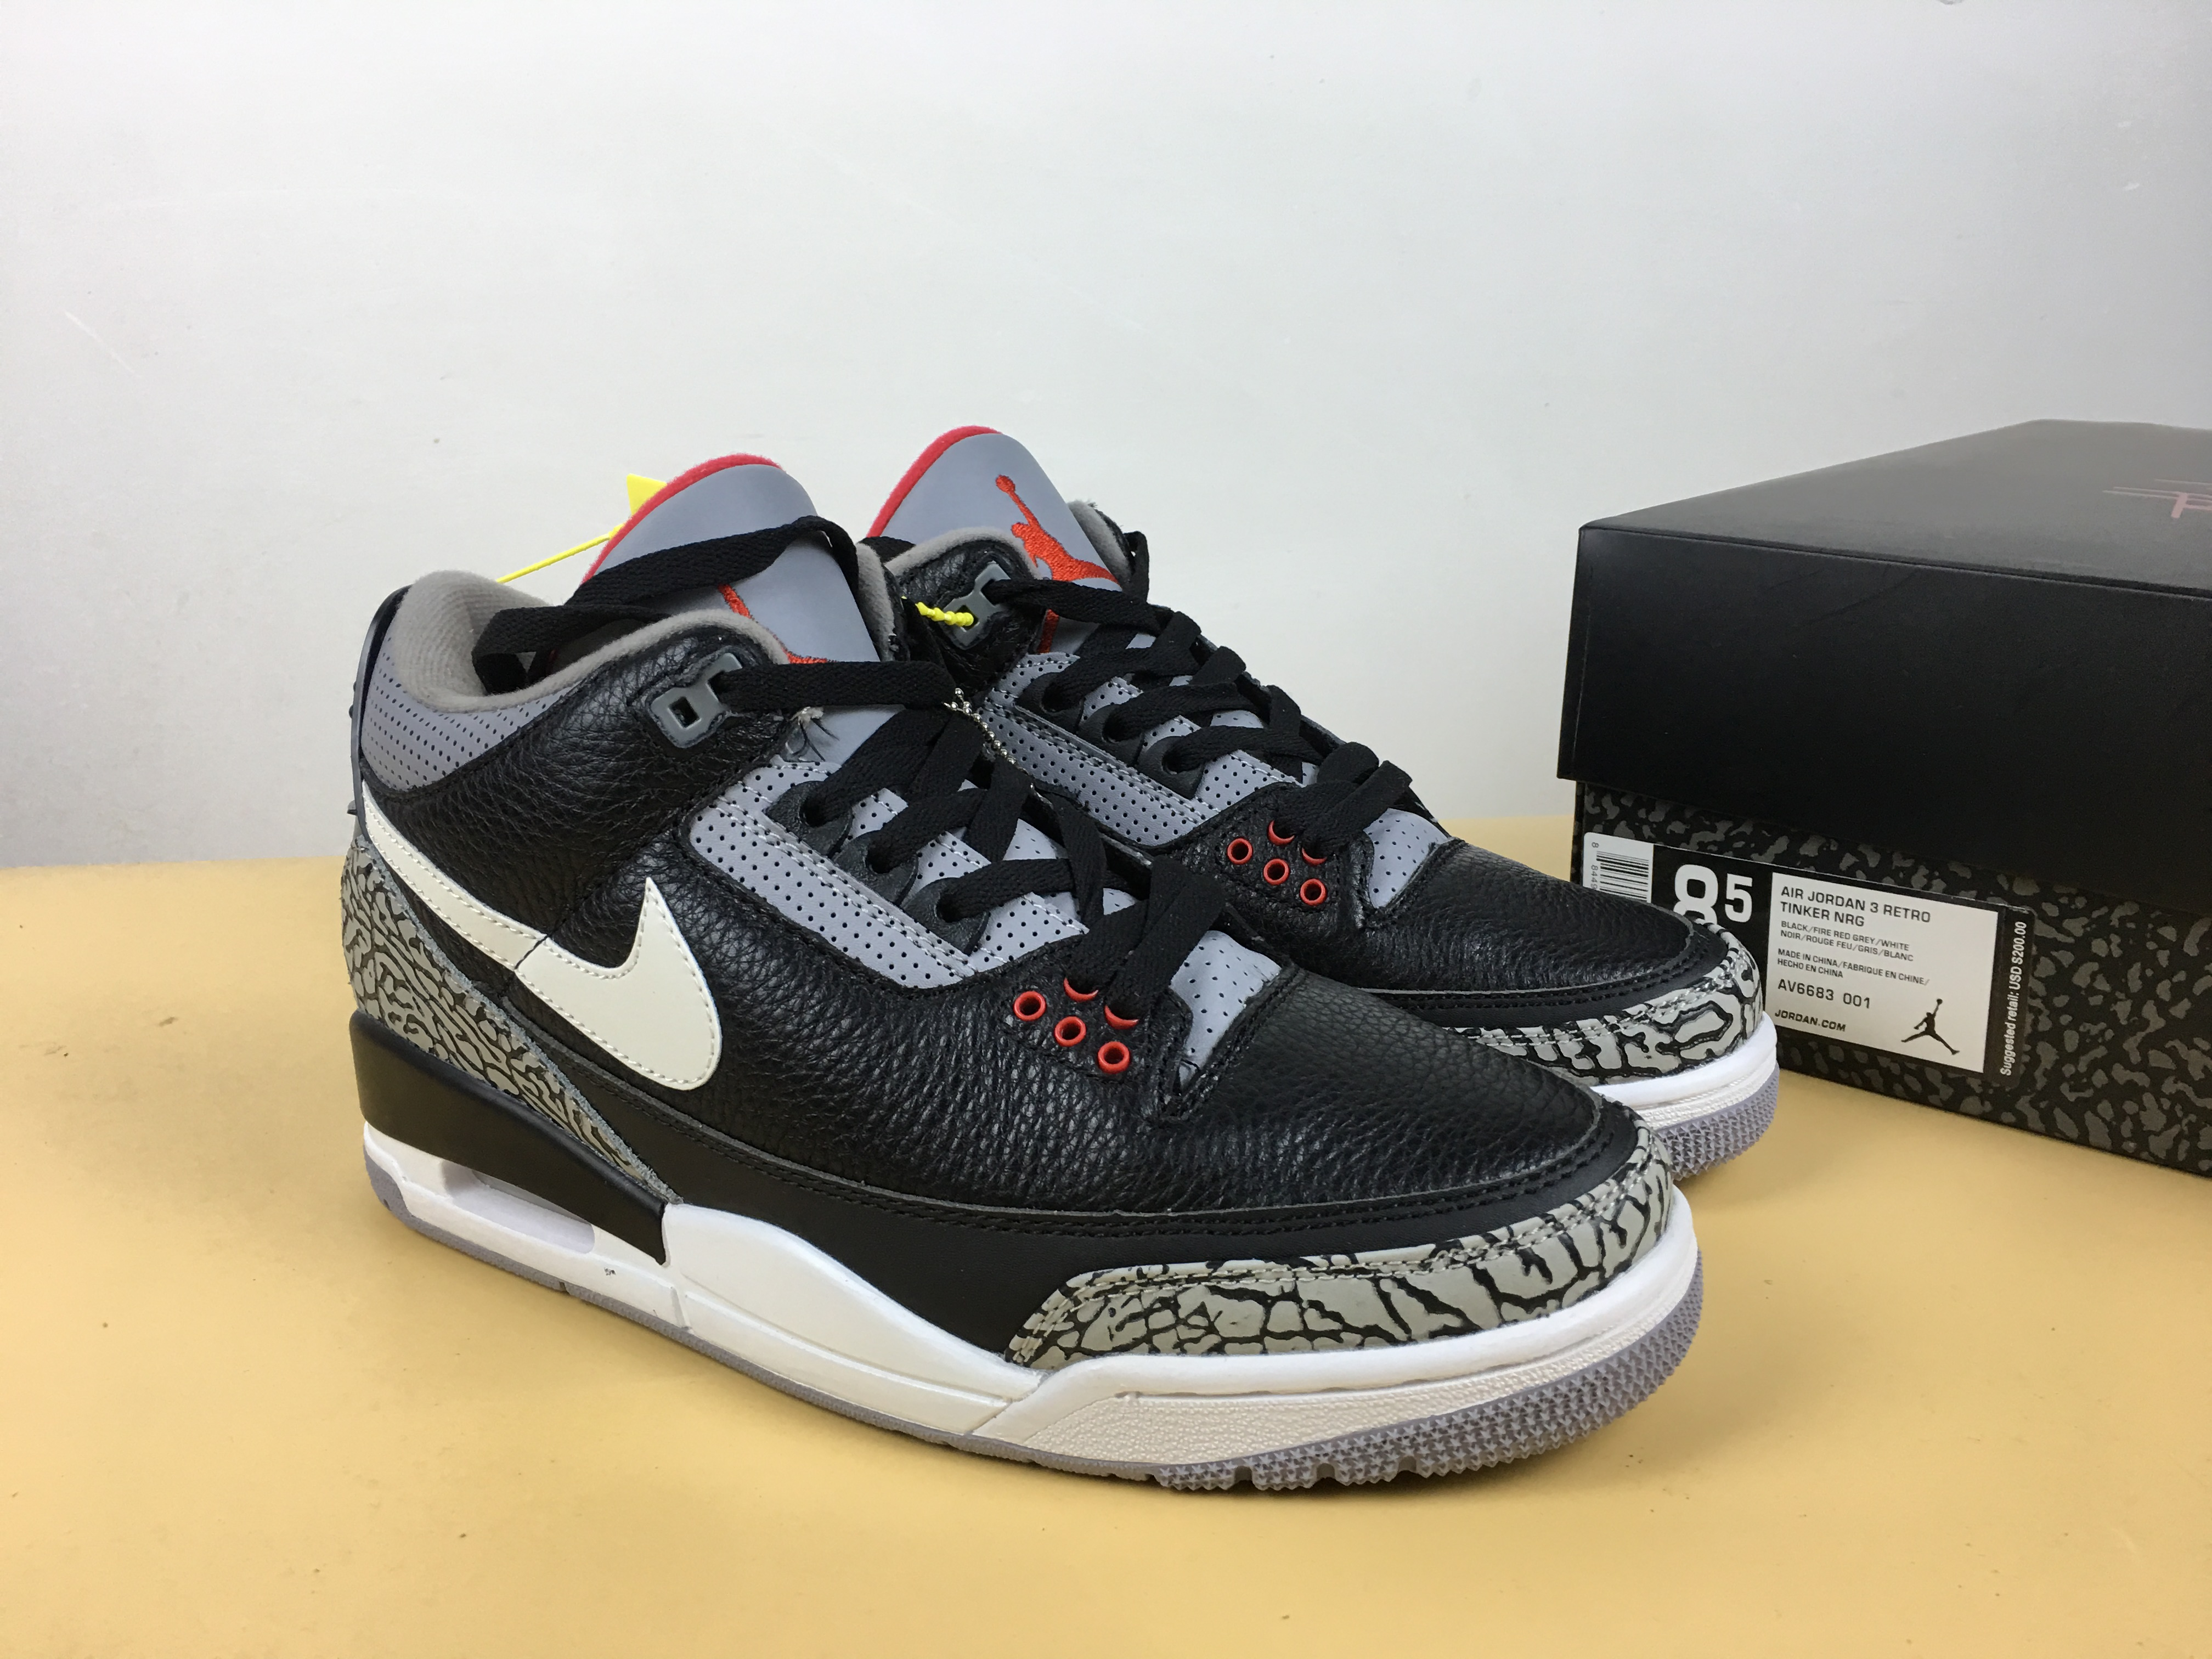 outlet store c1107 f76a4 Air Jordan 3 JTH Black Cement Grey White Shoes [18retro5810 ...